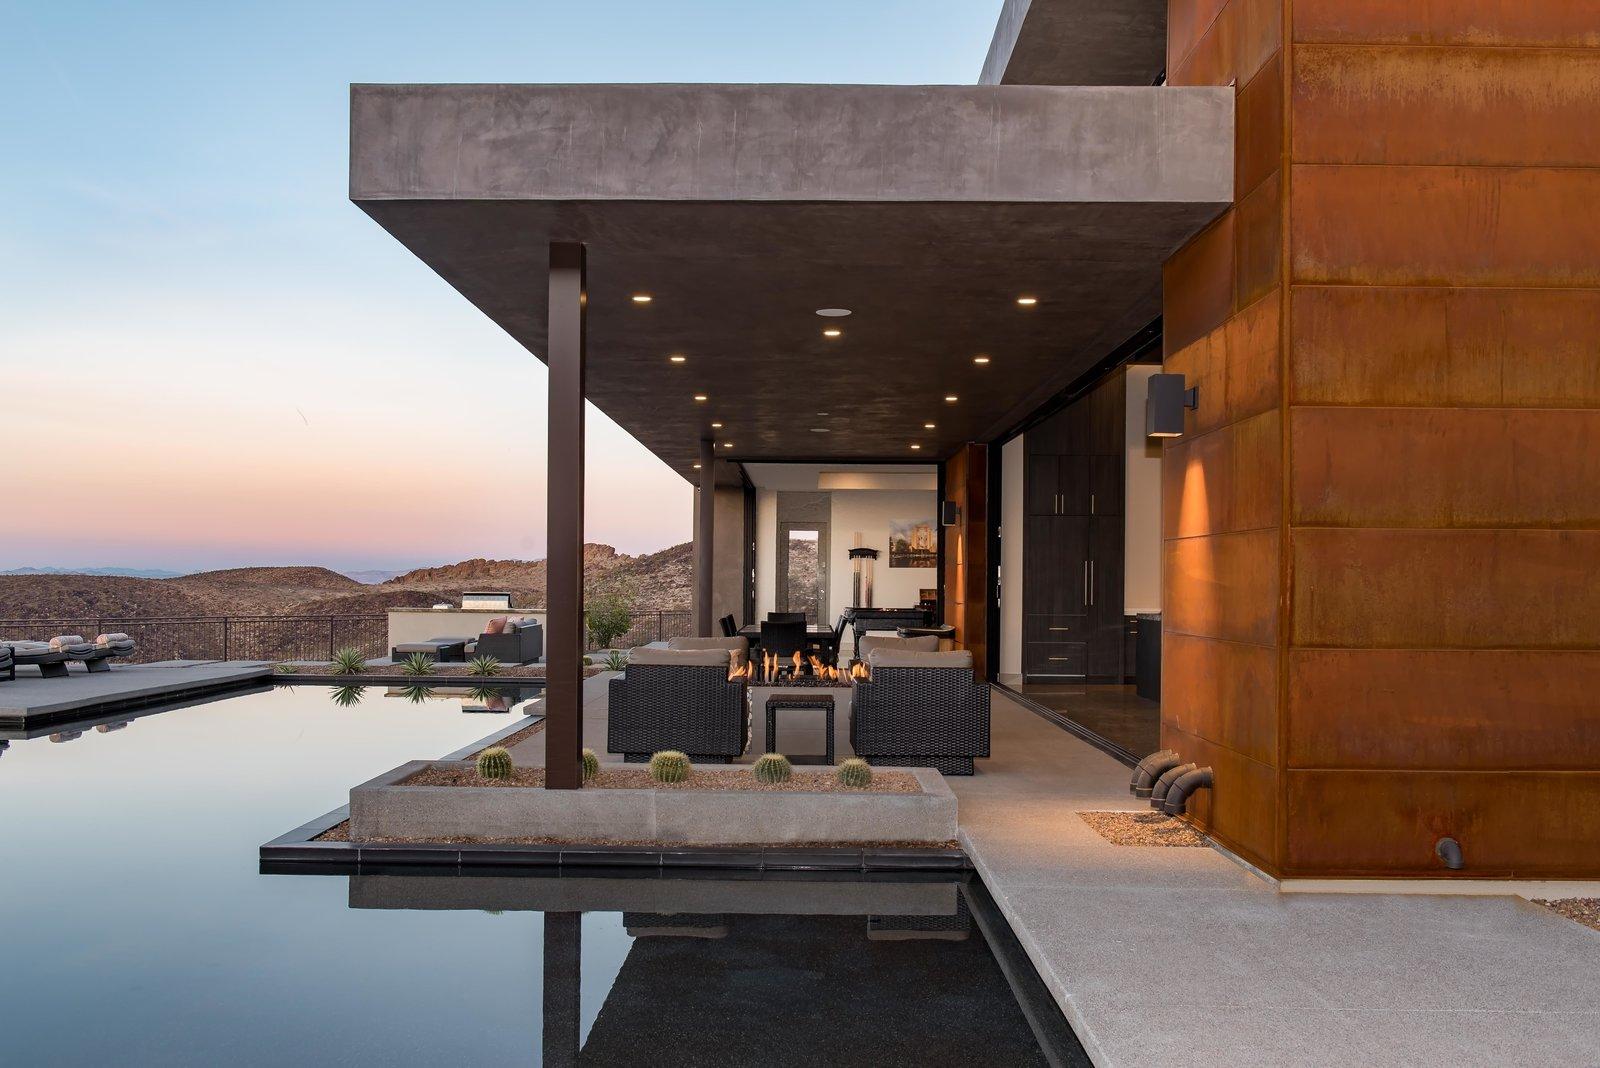 Exterior, House Building Type, Concrete Siding Material, Metal Roof Material, Stone Siding Material, Flat RoofLine, and Metal Siding Material rear exterior twilight   Cloud Chaser